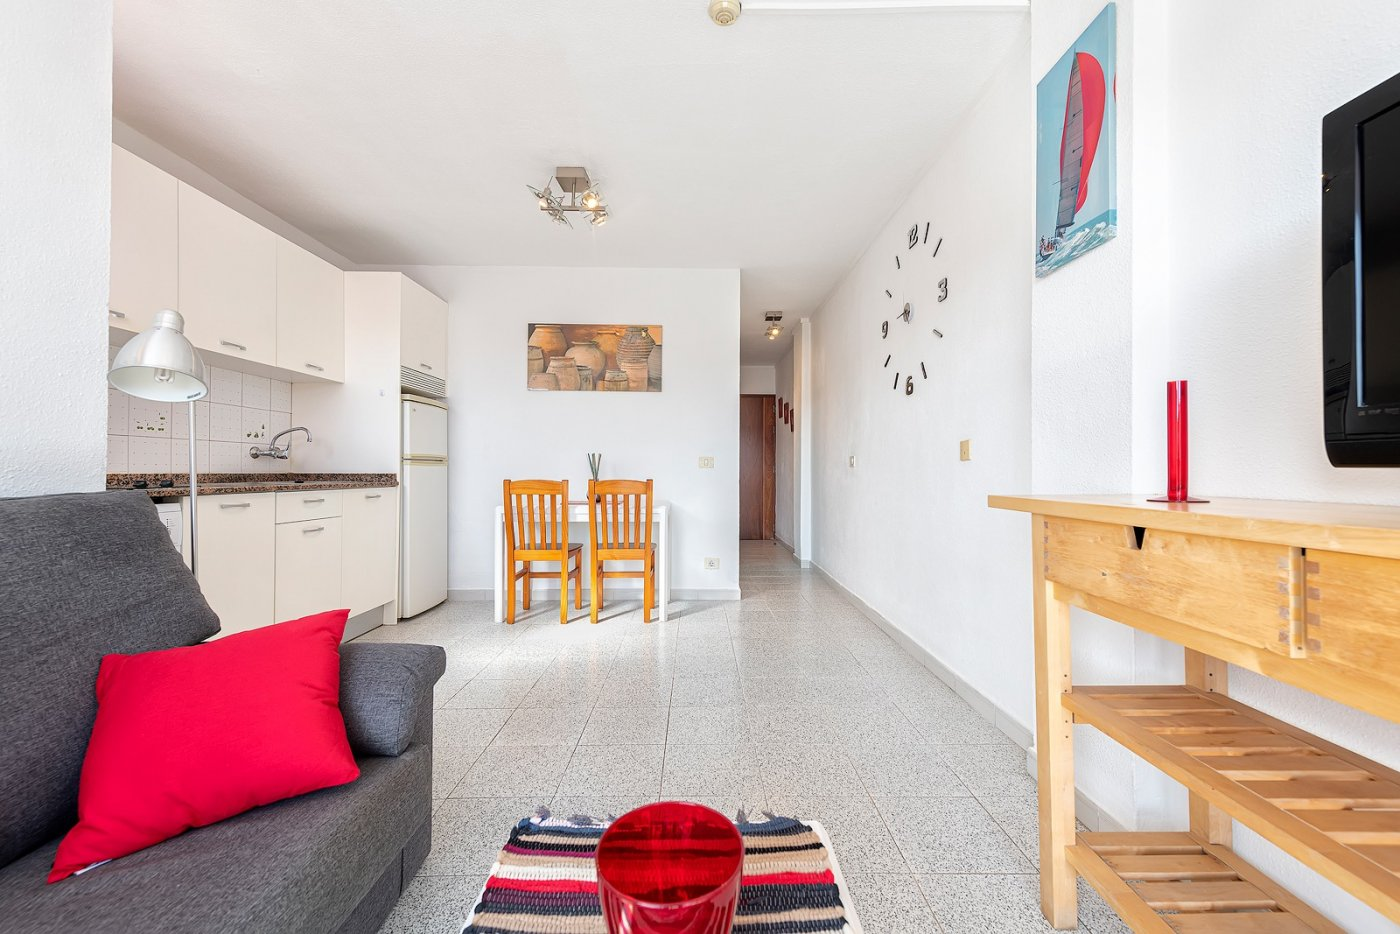 Apartamento · Las Palmas De Gran Canaria · San Bartolomé De Tirajana 134.000€€